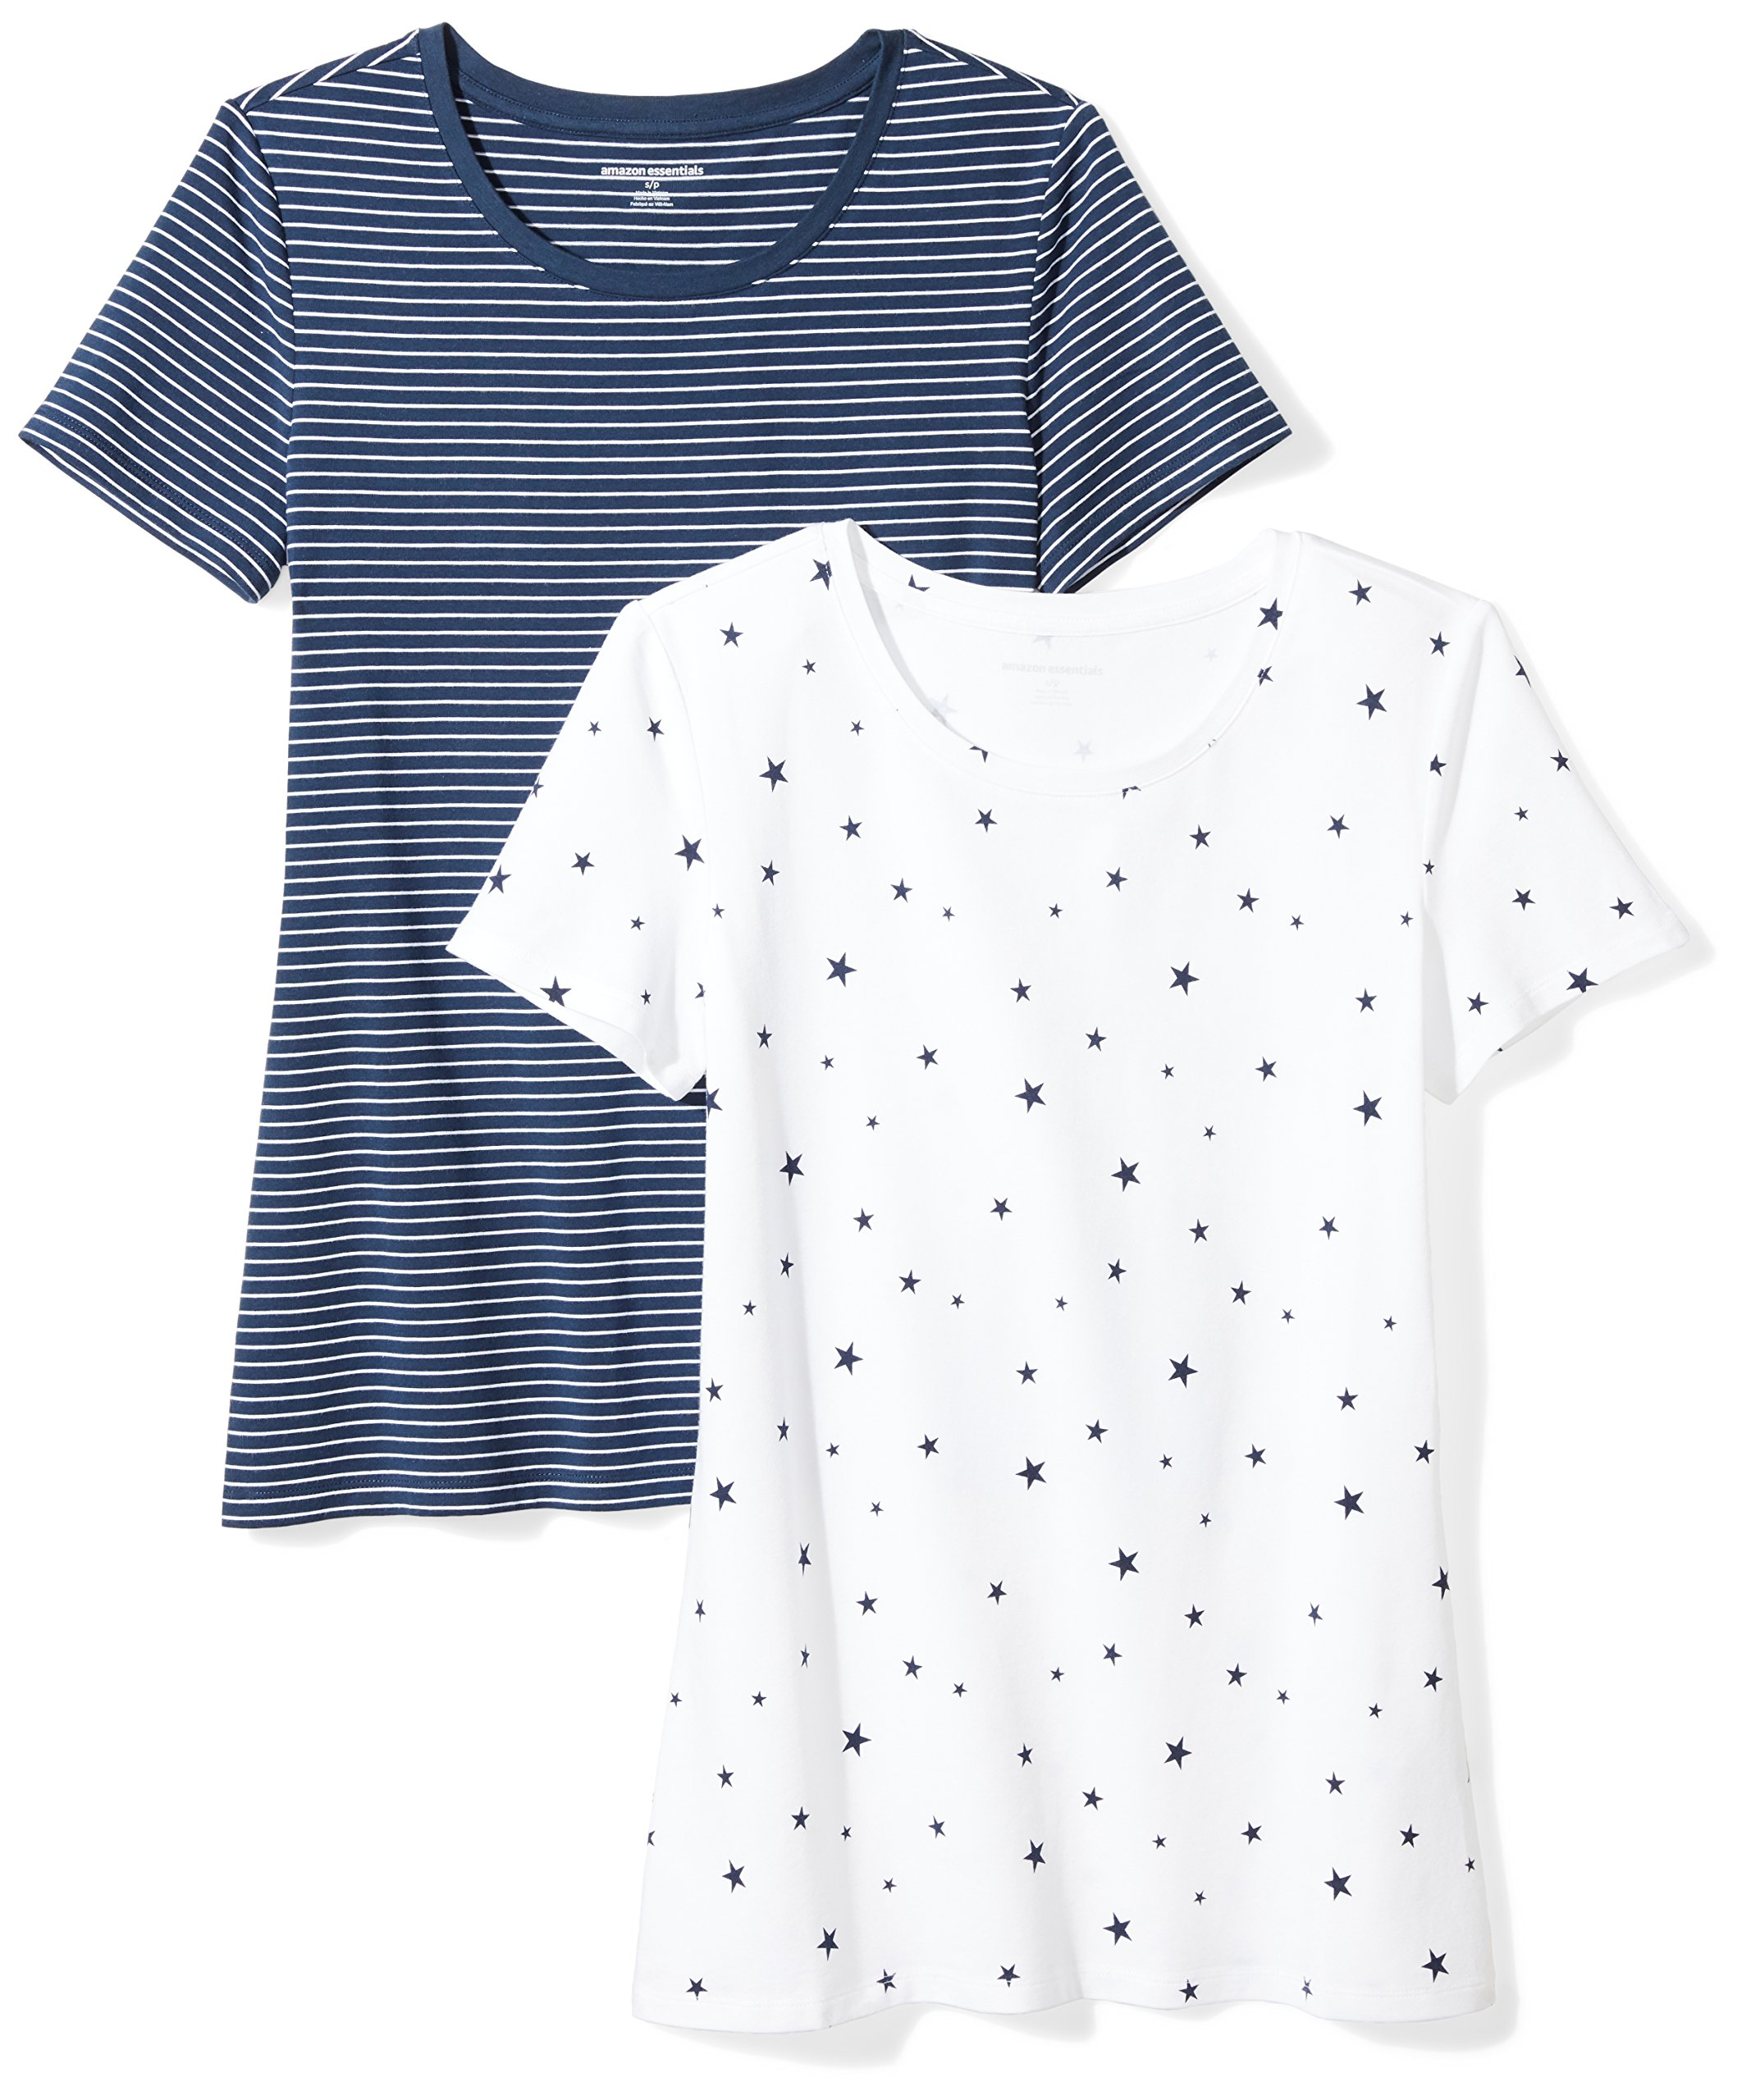 Amazon Essentials Women's 2-Pack Short-Sleeve Crewneck Patterned T-Shirt, Navy Stripe/Star Print, X-Large